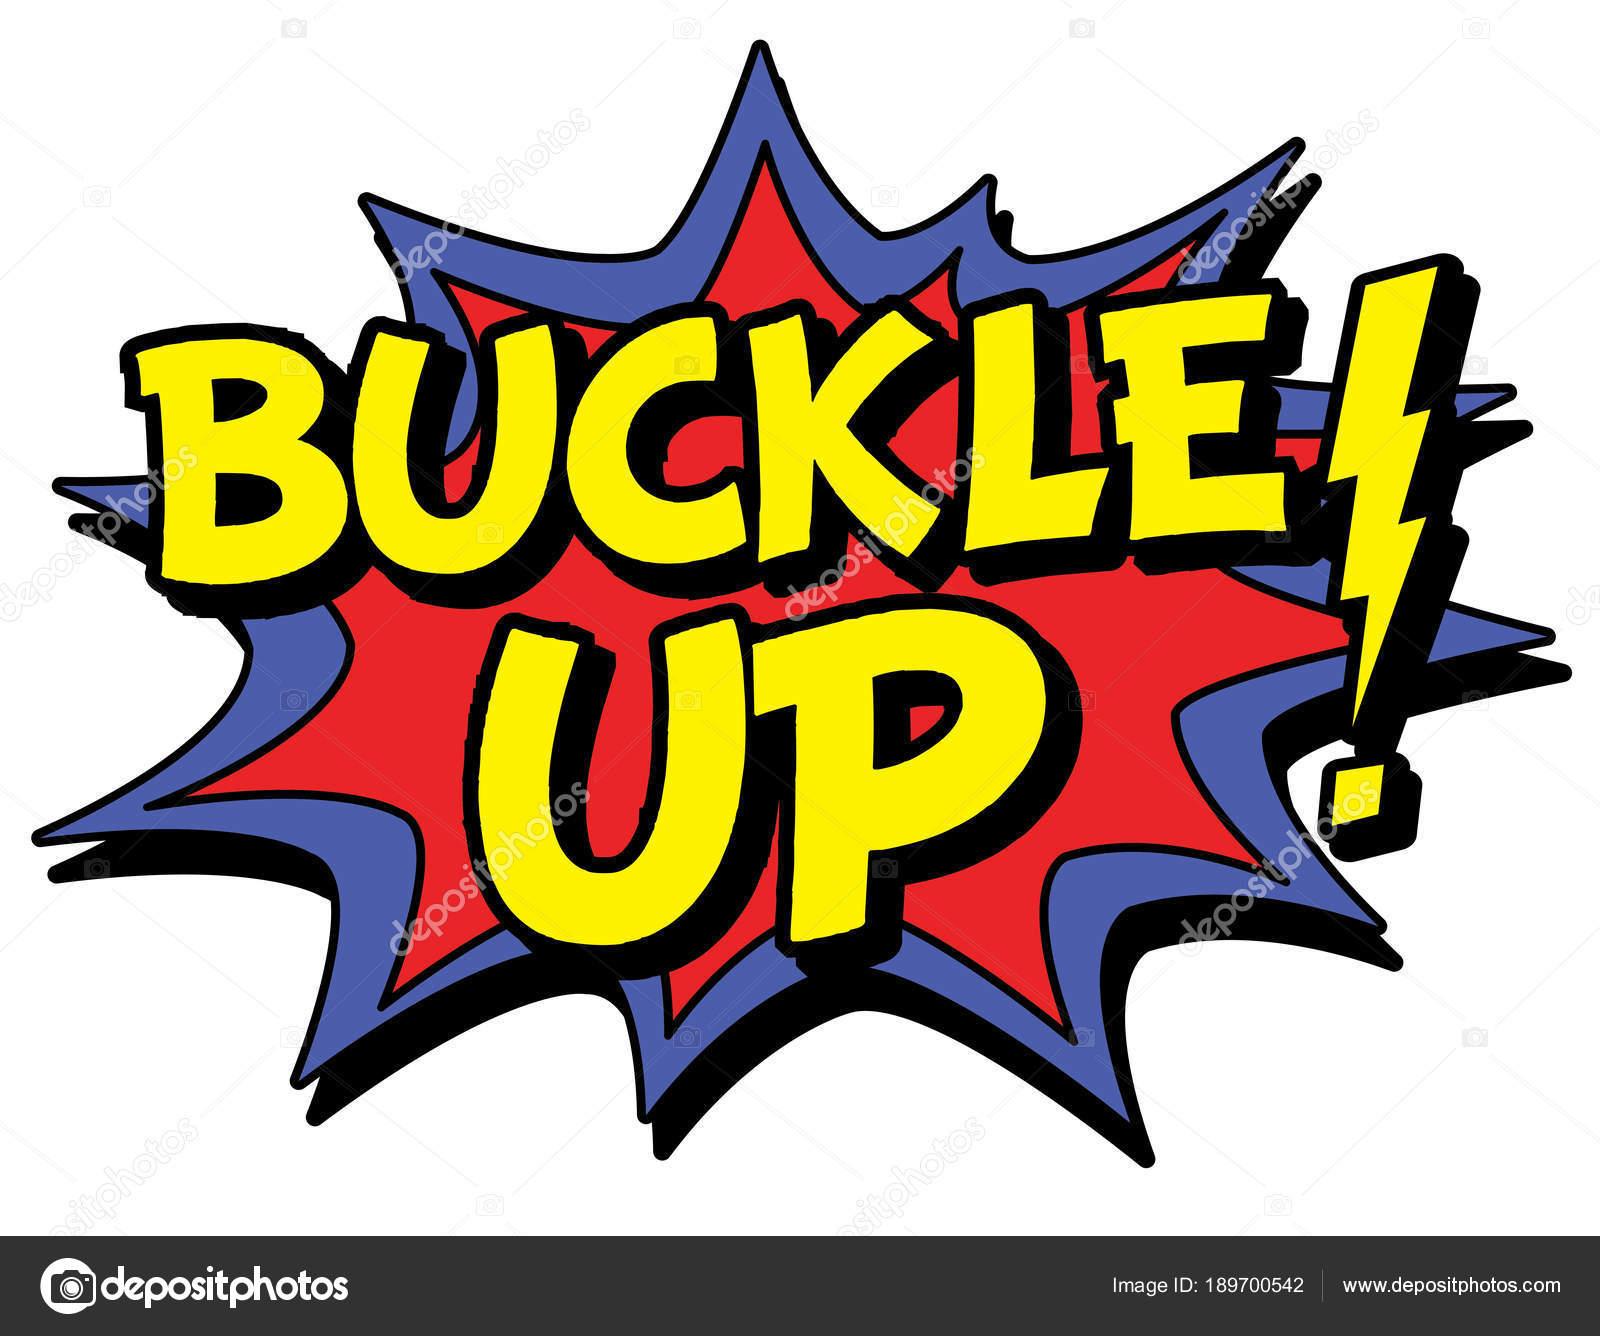 buckle blast vector illustration stock vector c scotferdon 189700542 https depositphotos com 189700542 stock illustration buckle blast vector illustration html